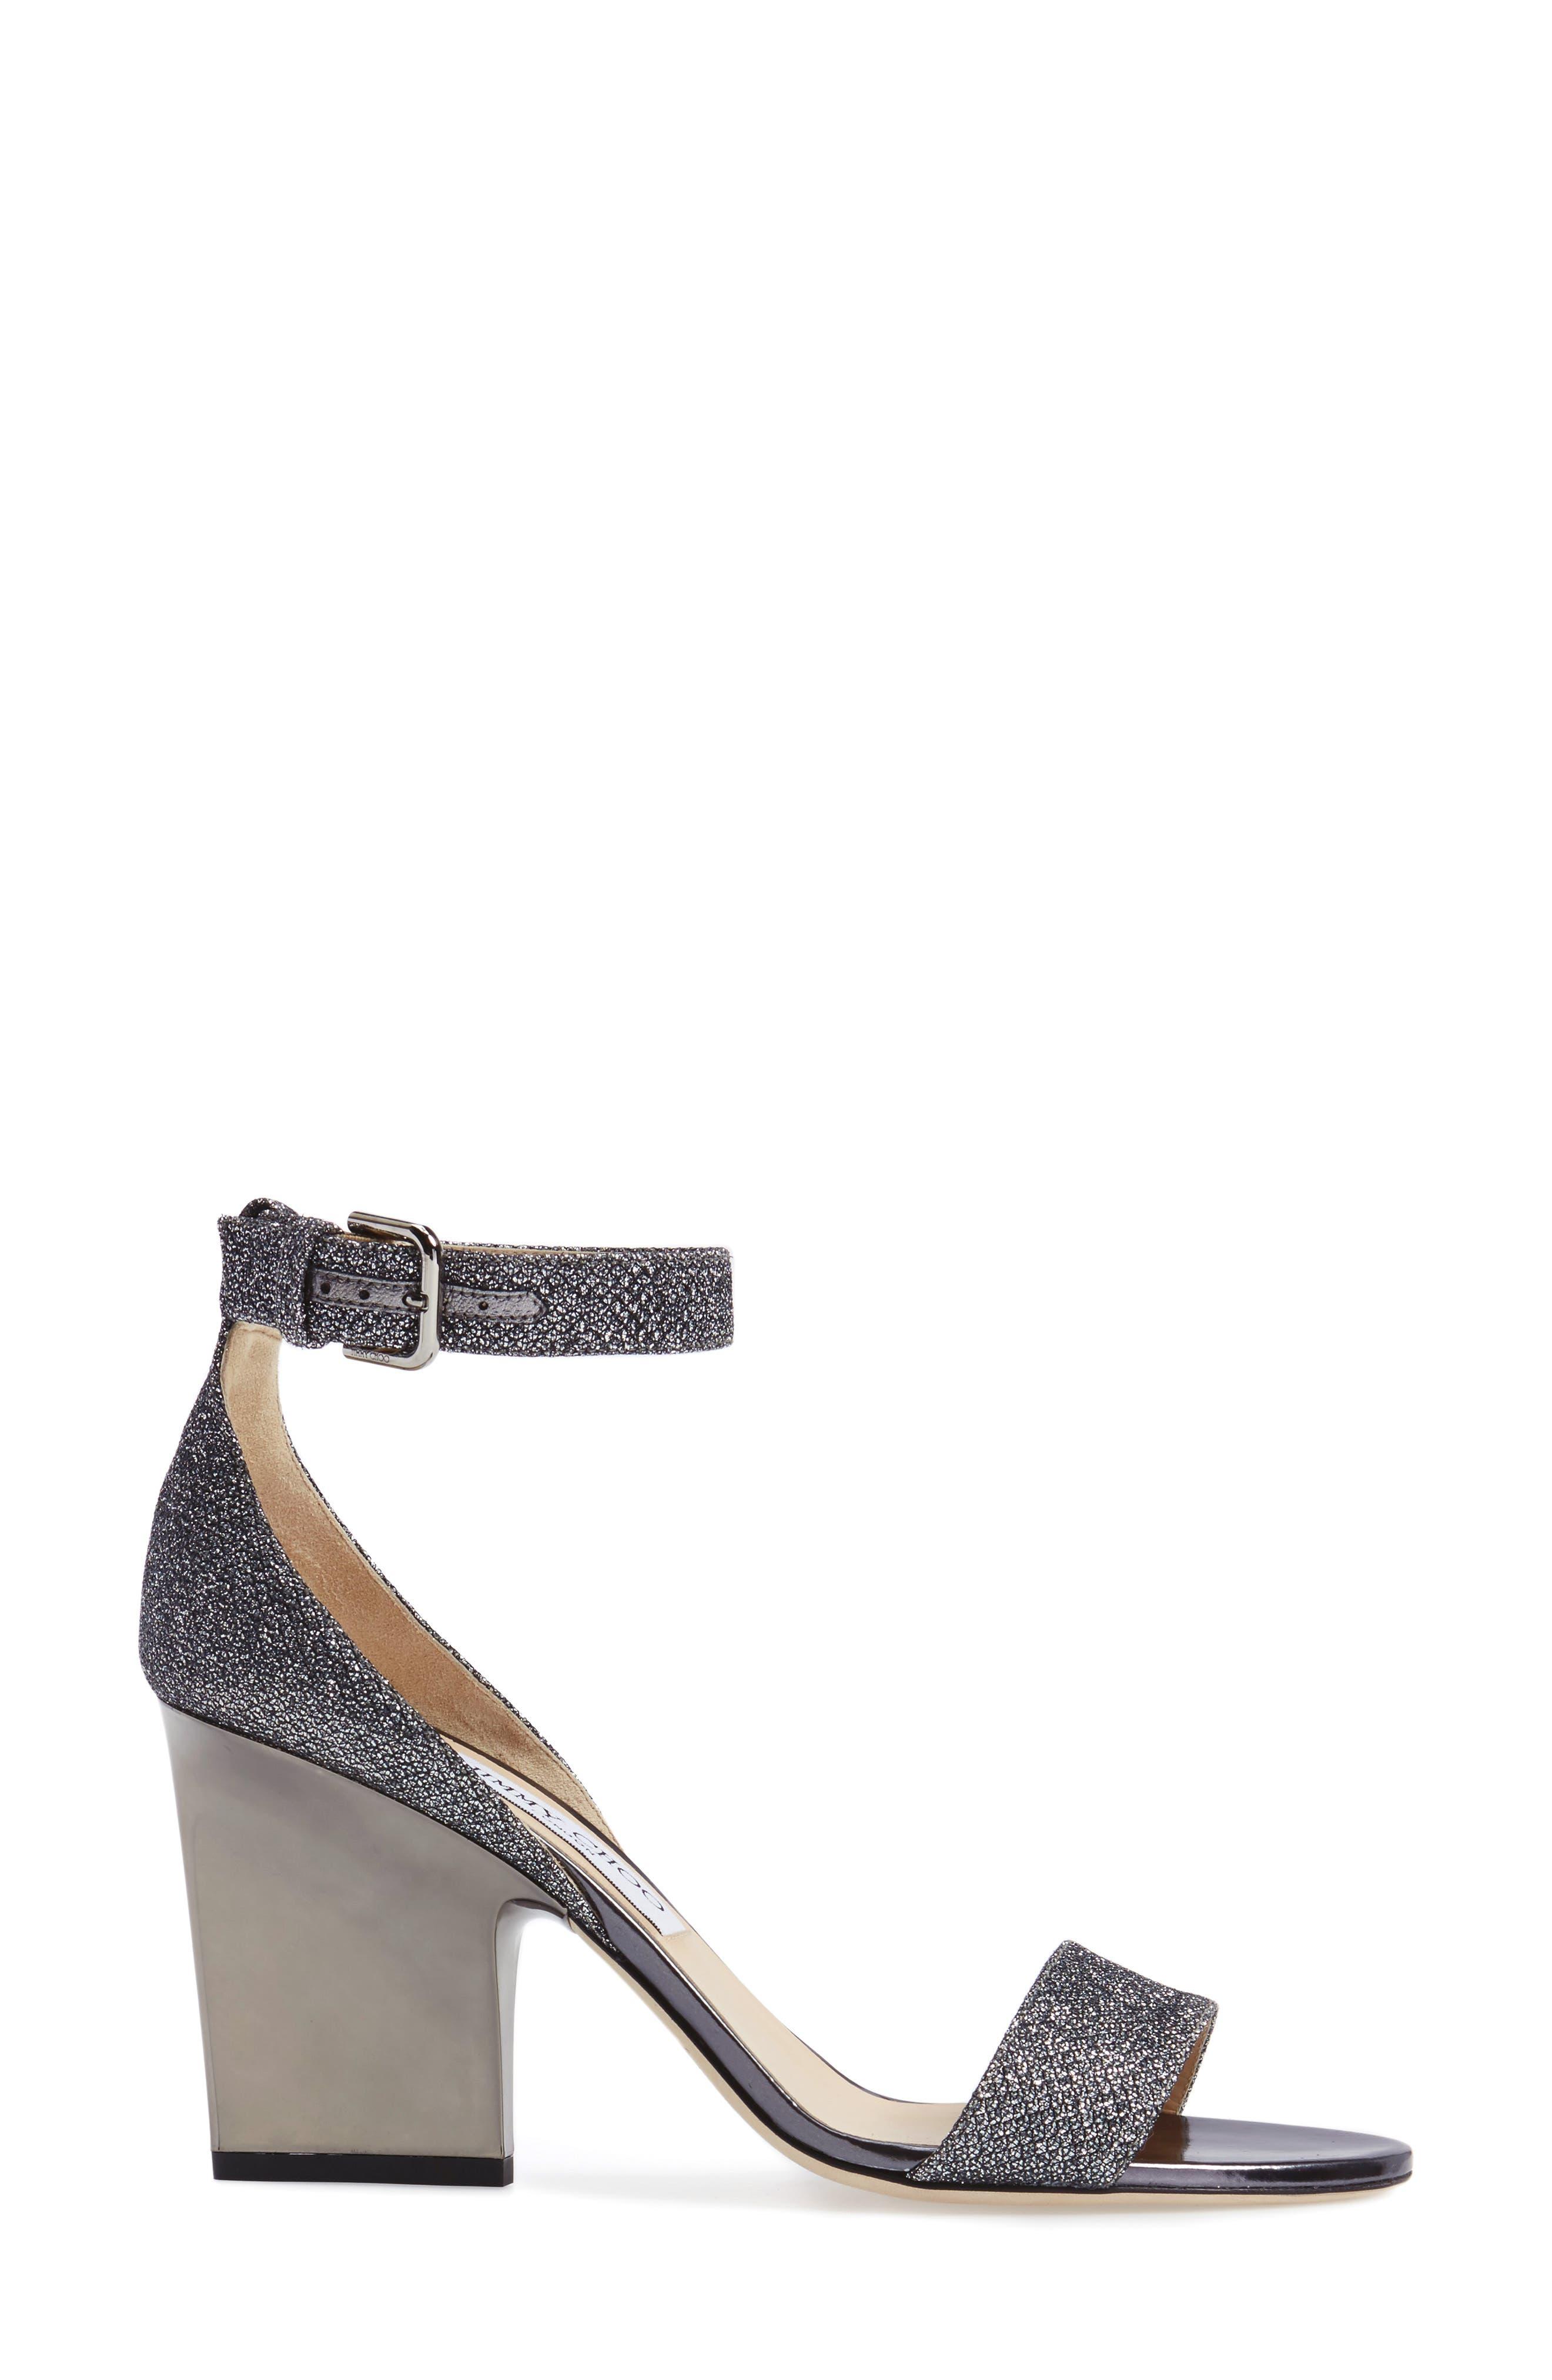 Edina Ankle Strap Sandal,                             Alternate thumbnail 3, color,                             Anthracite